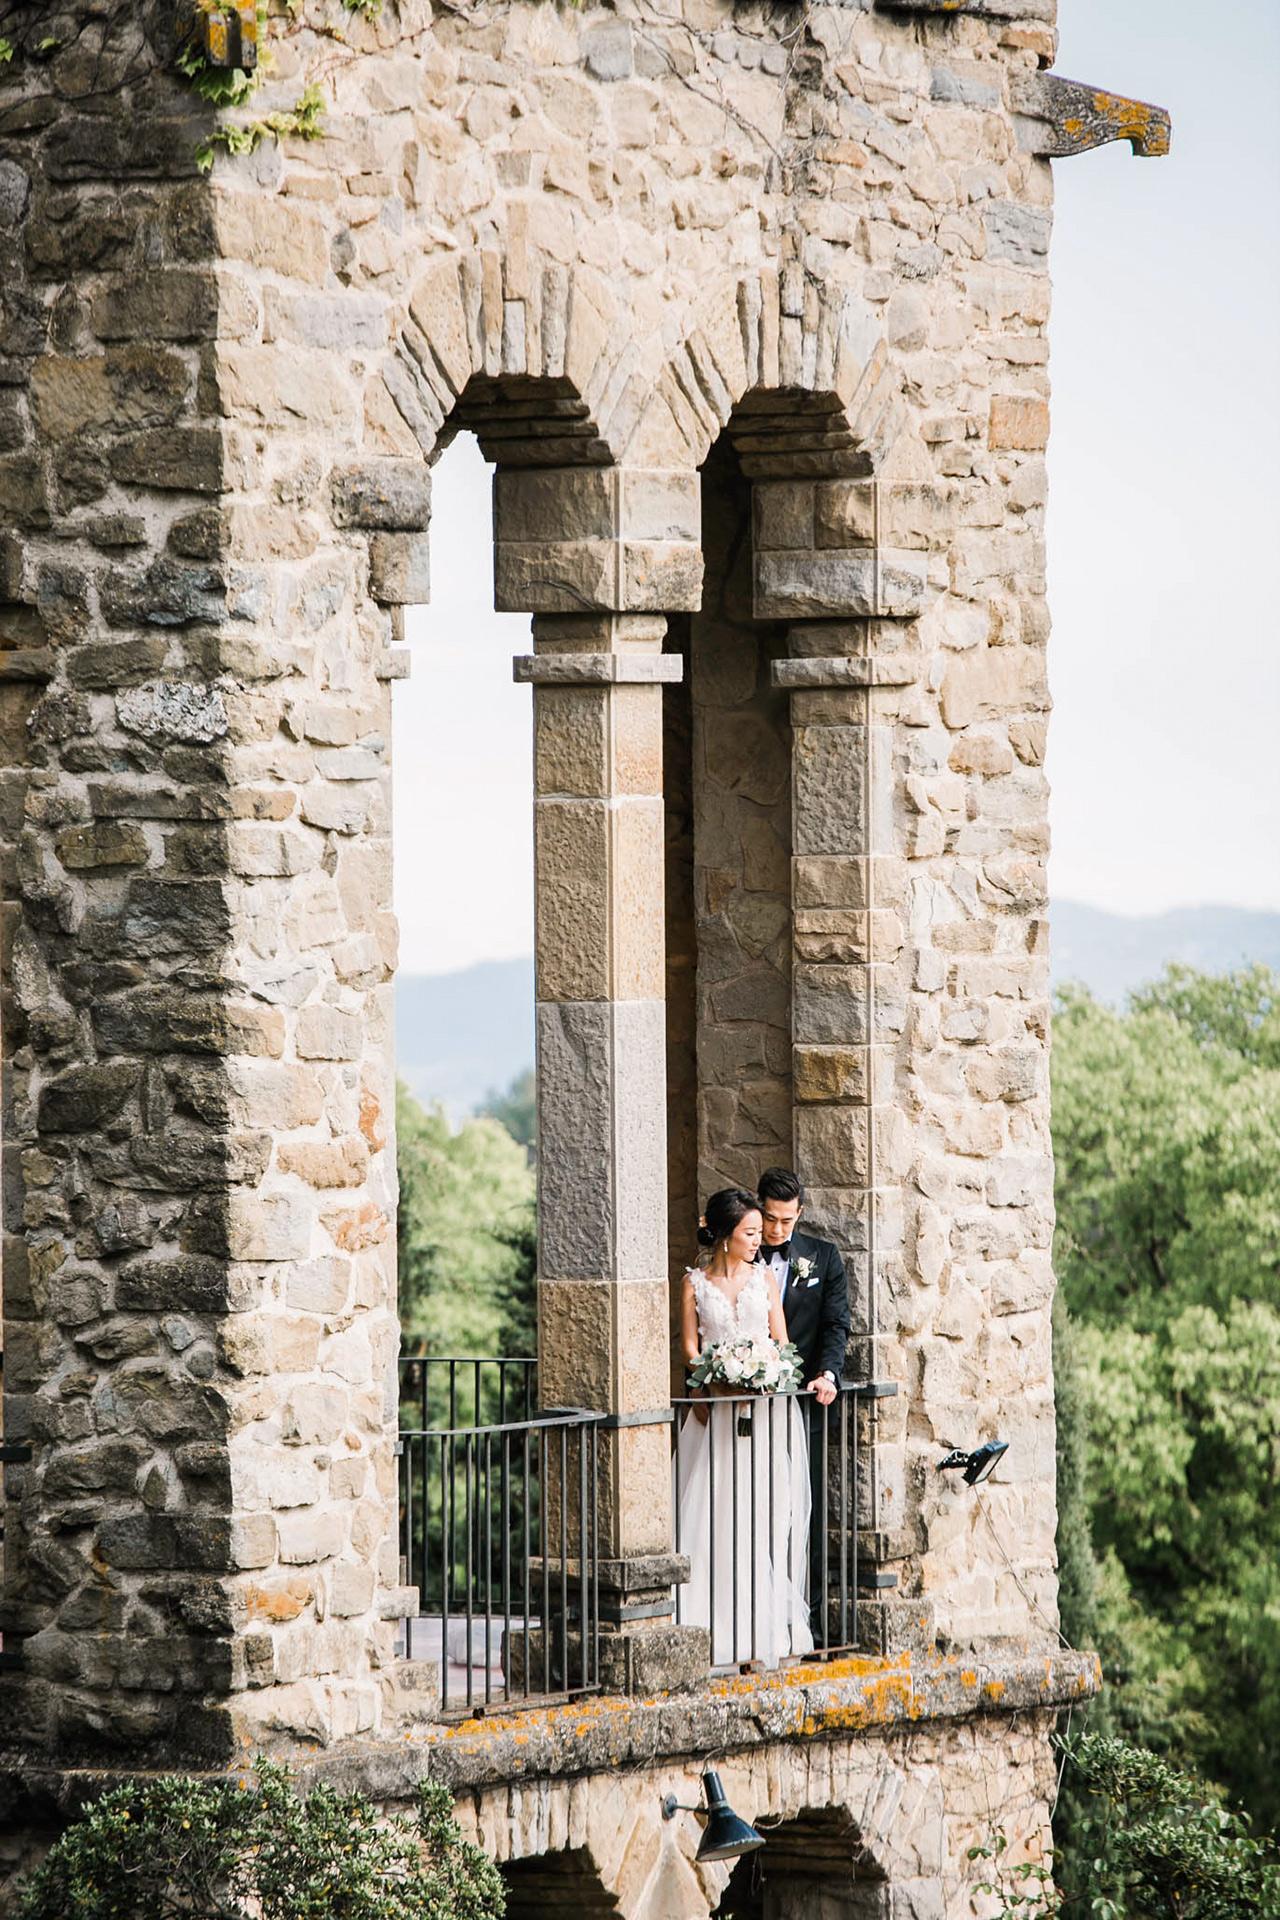 bride groom looking over stone building balcony